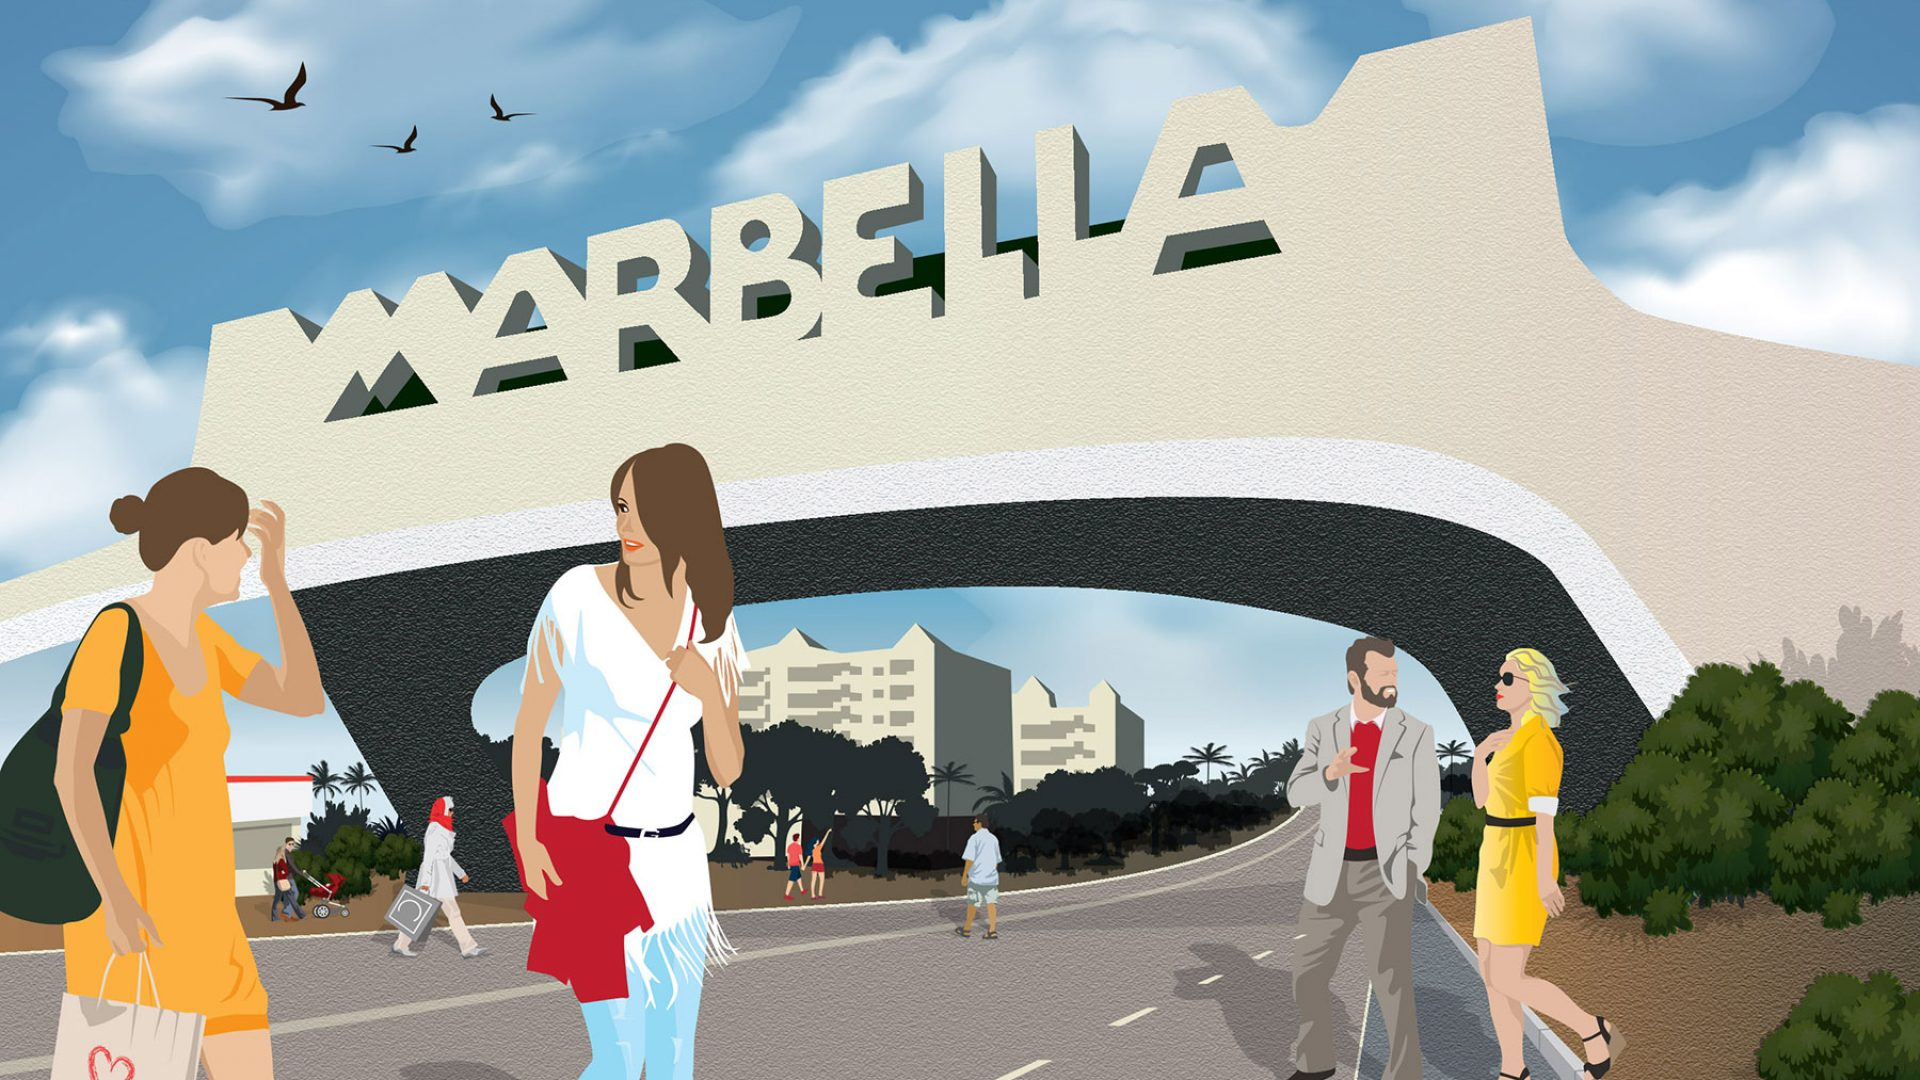 We ❤️ Marbella